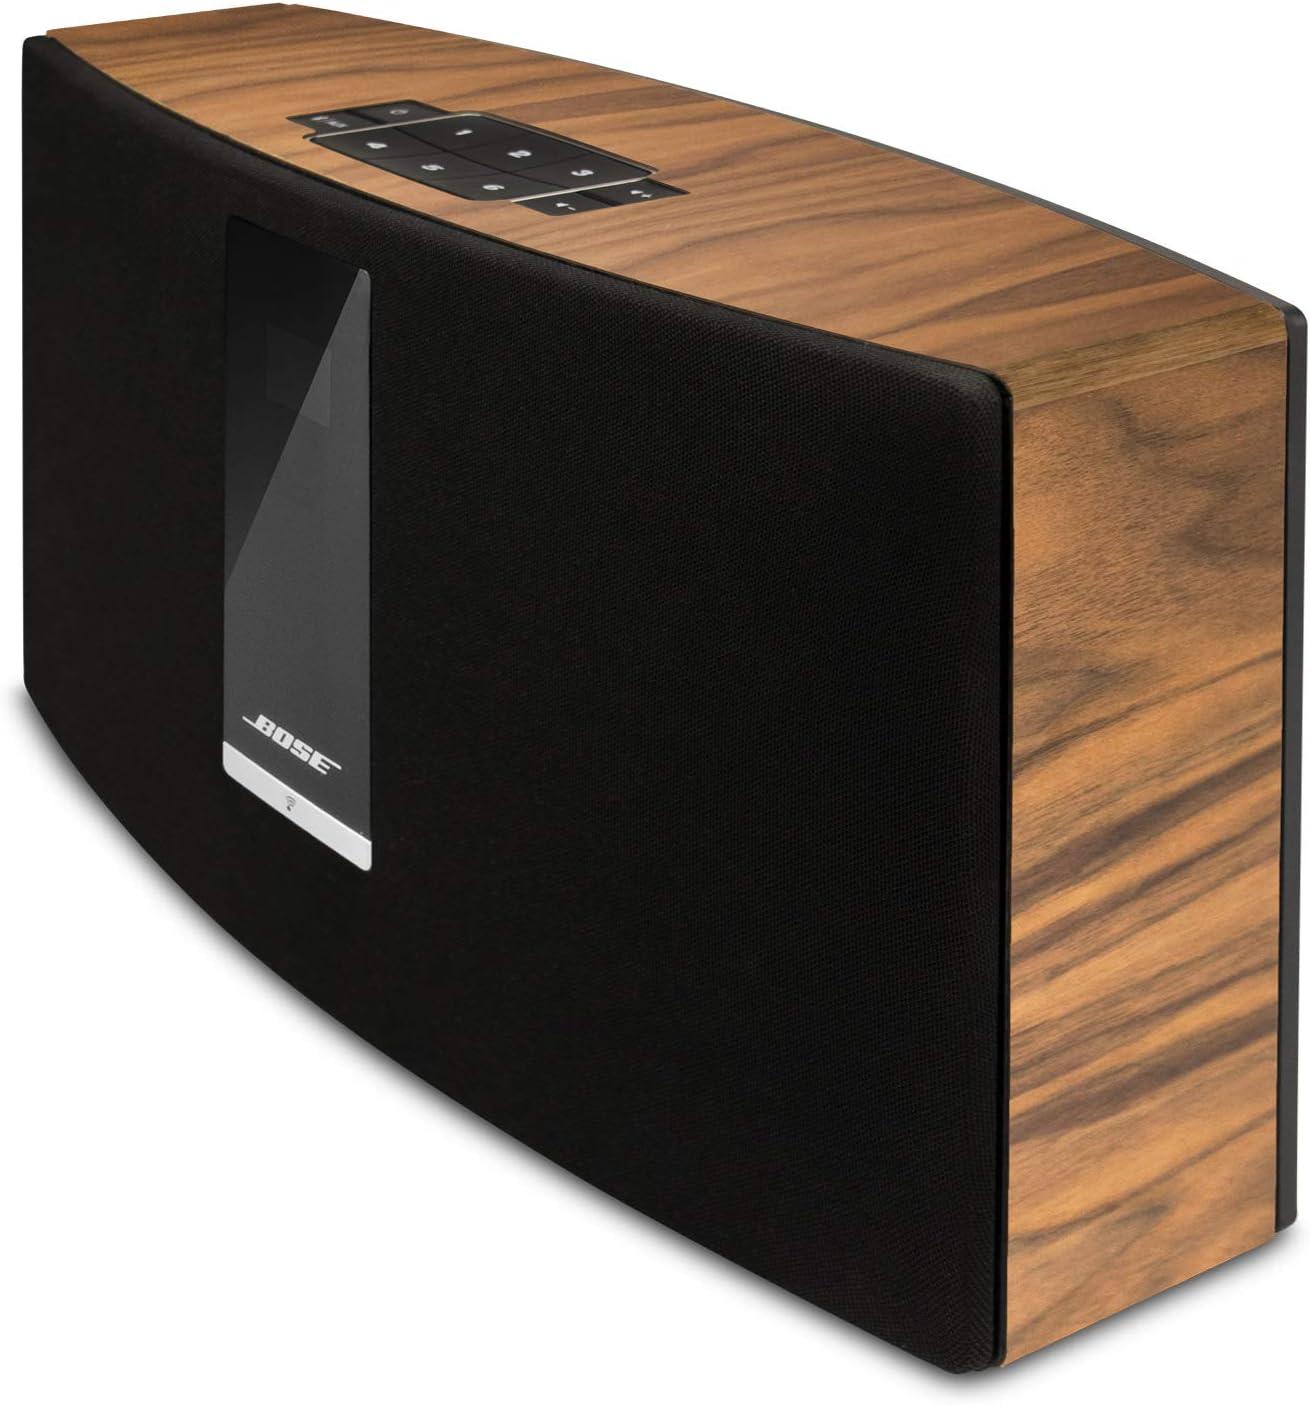 Balolo Walnuss Echtholz Cover Für Bose Soundtouch 20 Elektronik